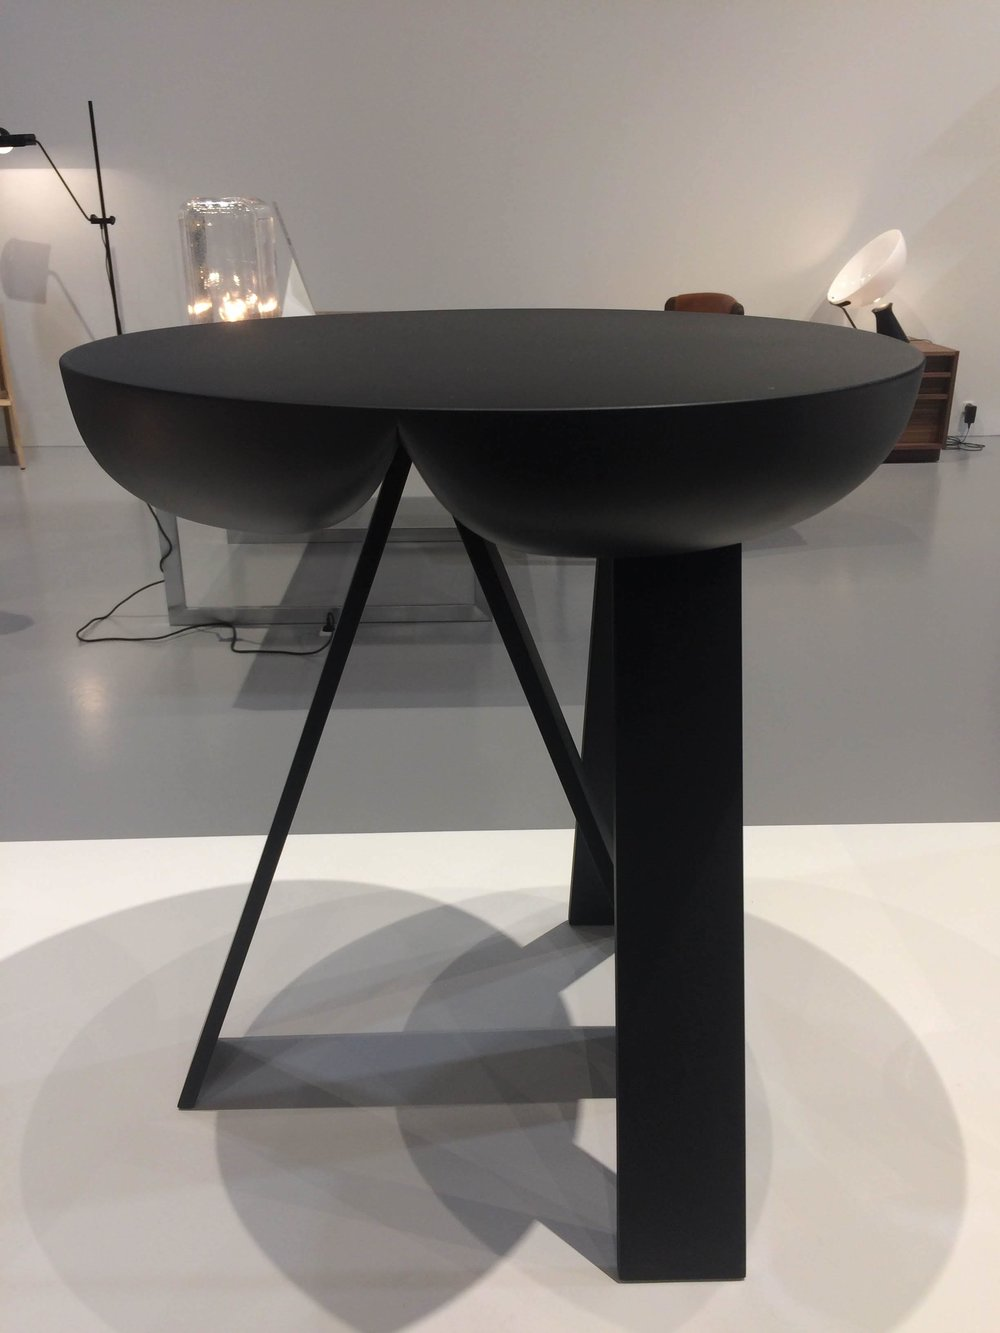 Side Table No. 2 by PlueerSmitt. KARAKTER